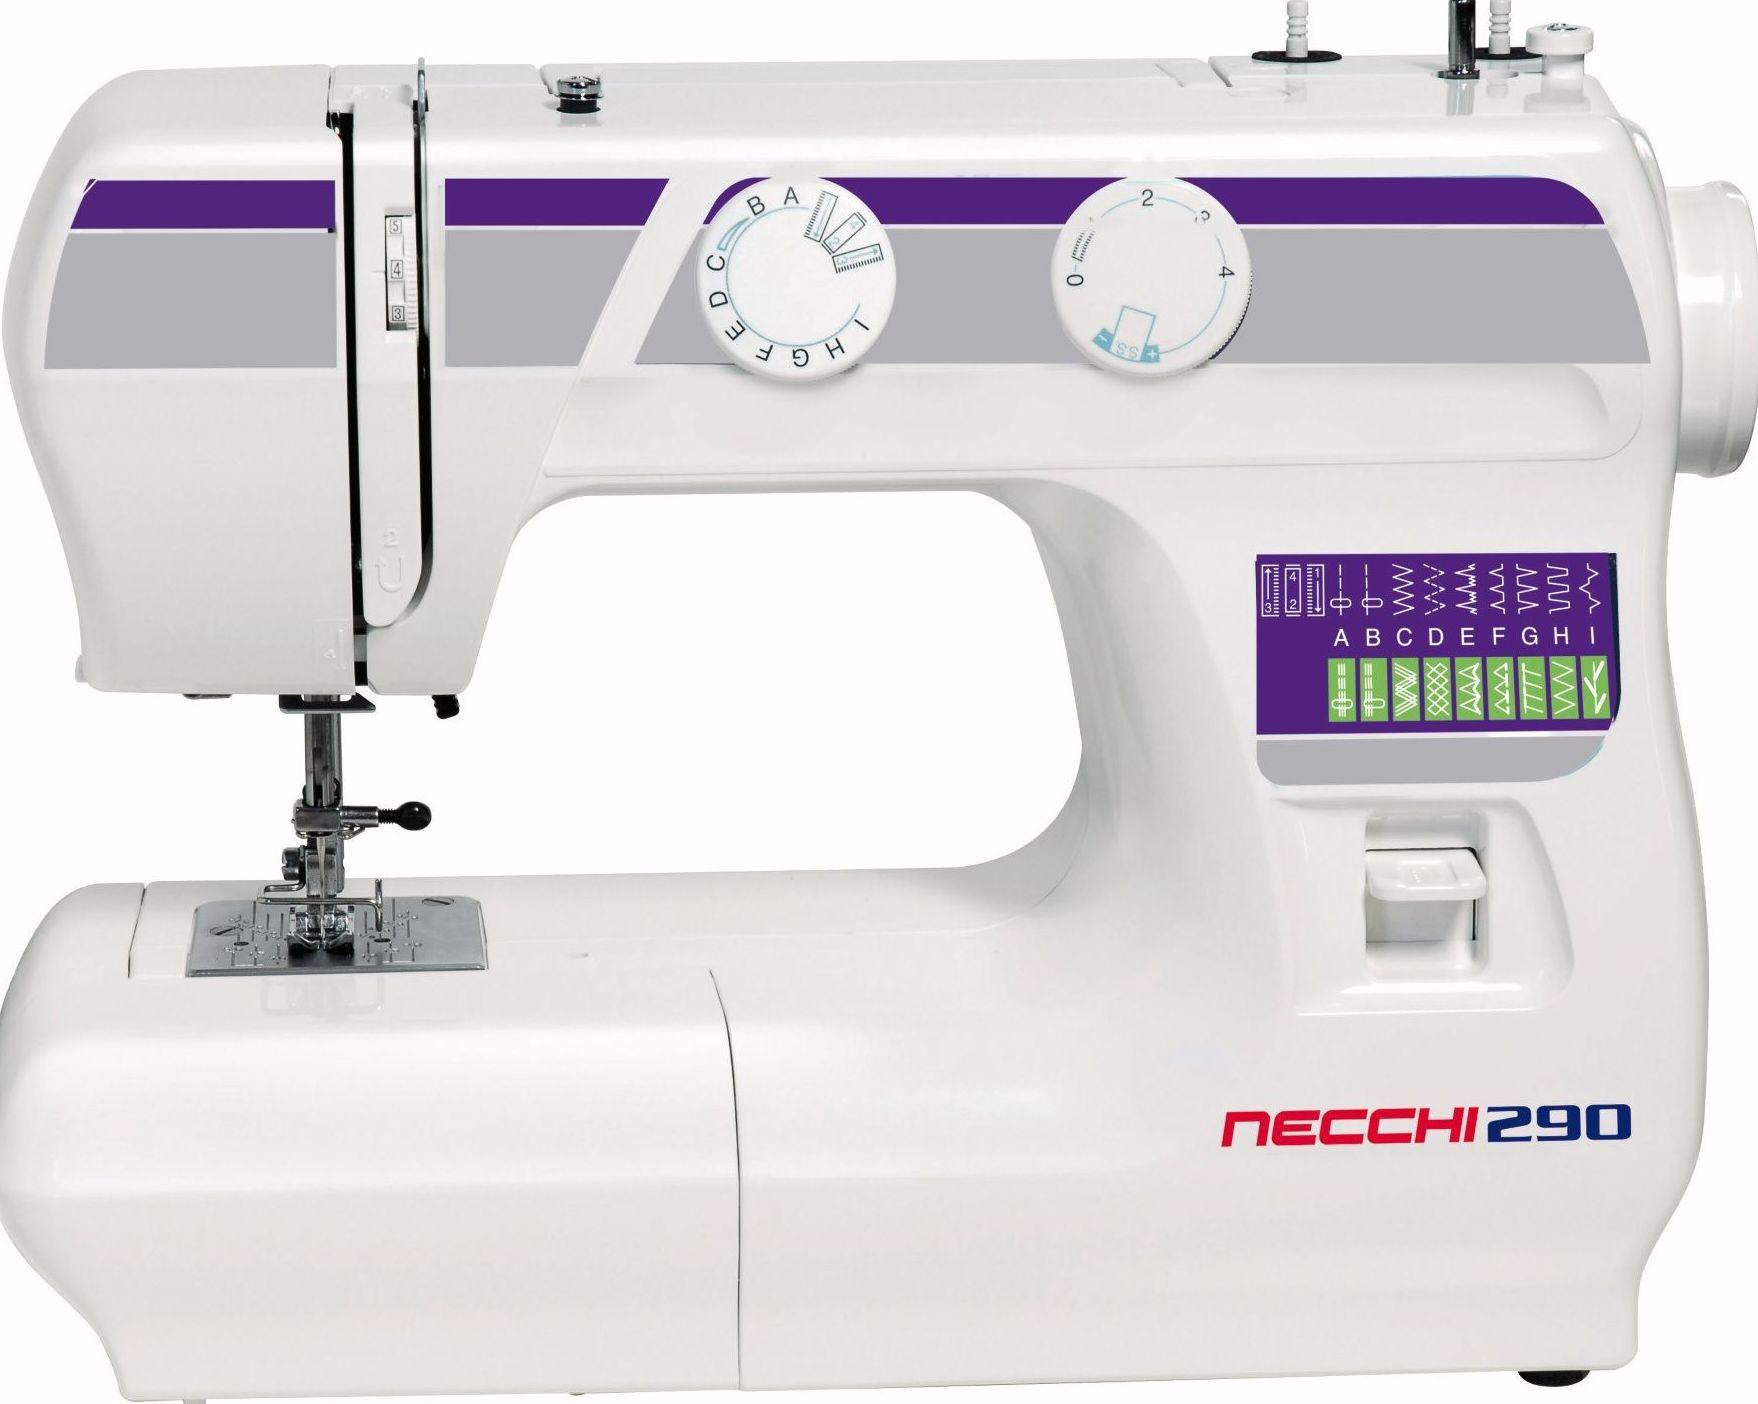 Máquina de coser Sigma Necchi modelo 290